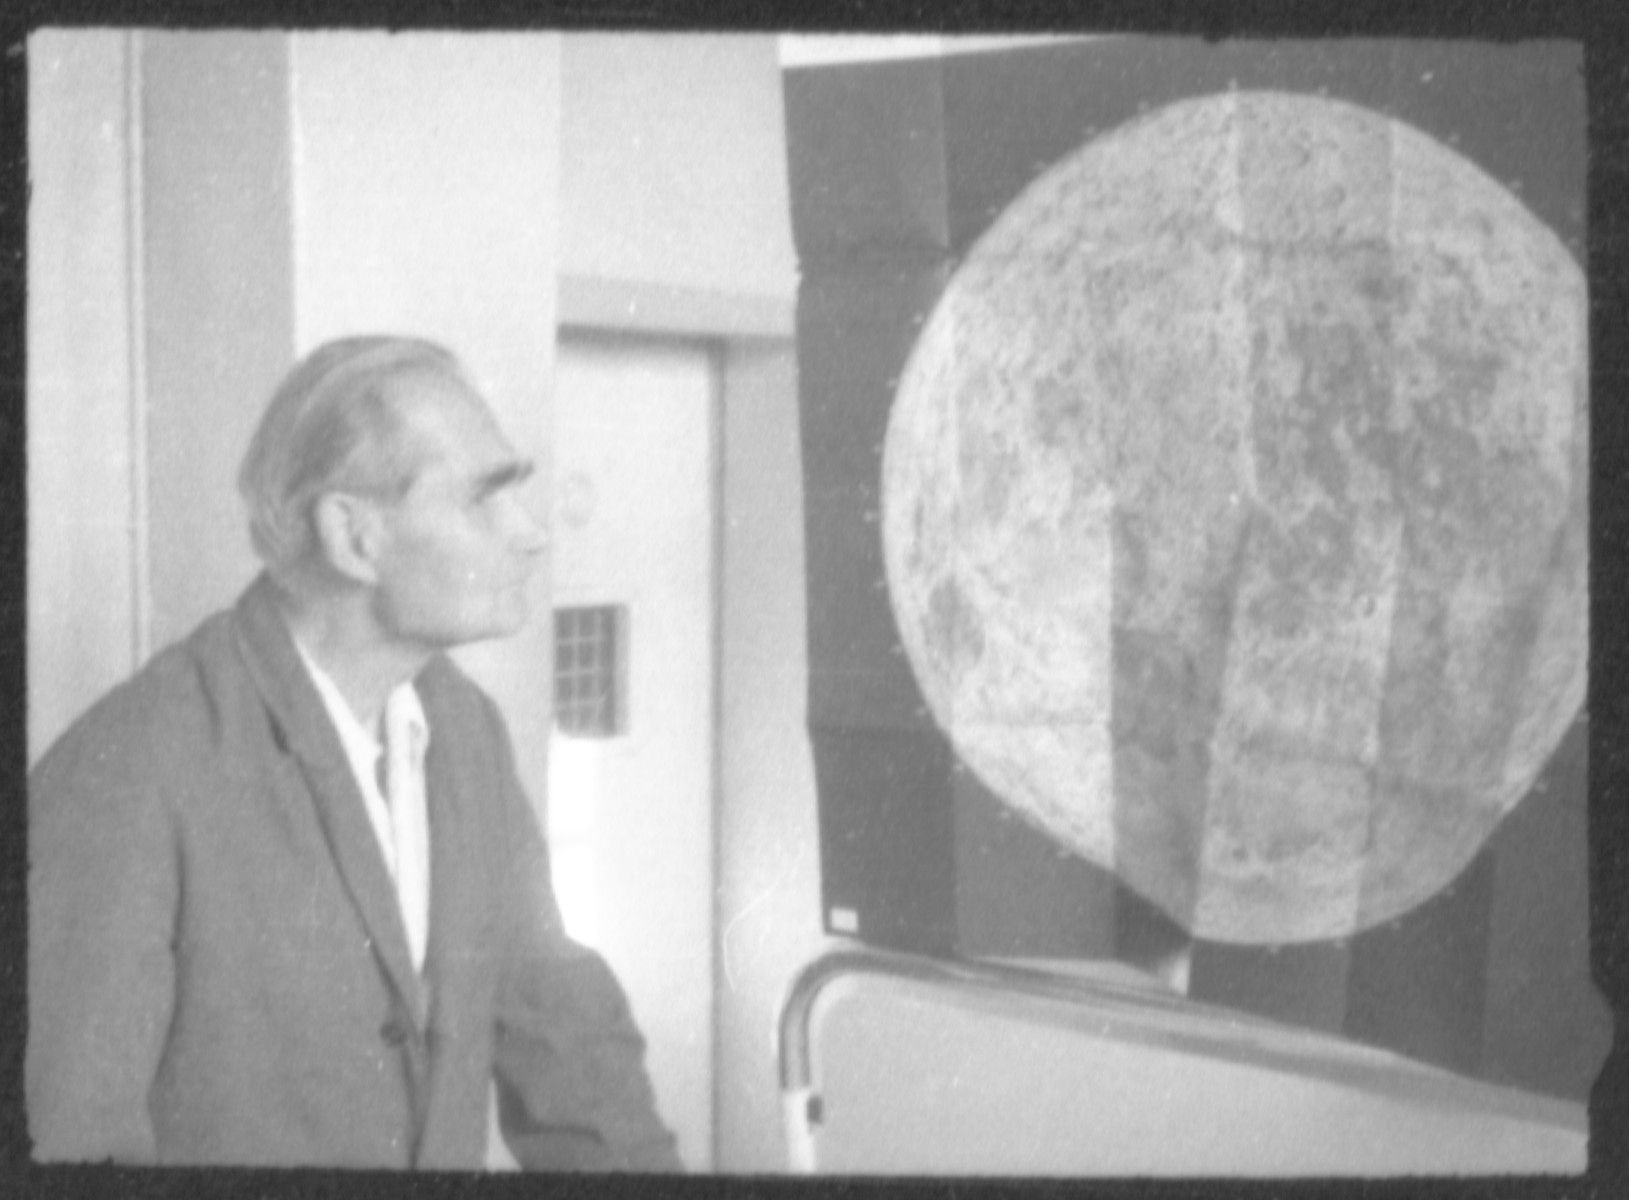 Rudolf Hess studies a poster of the moon in Spandau prison.